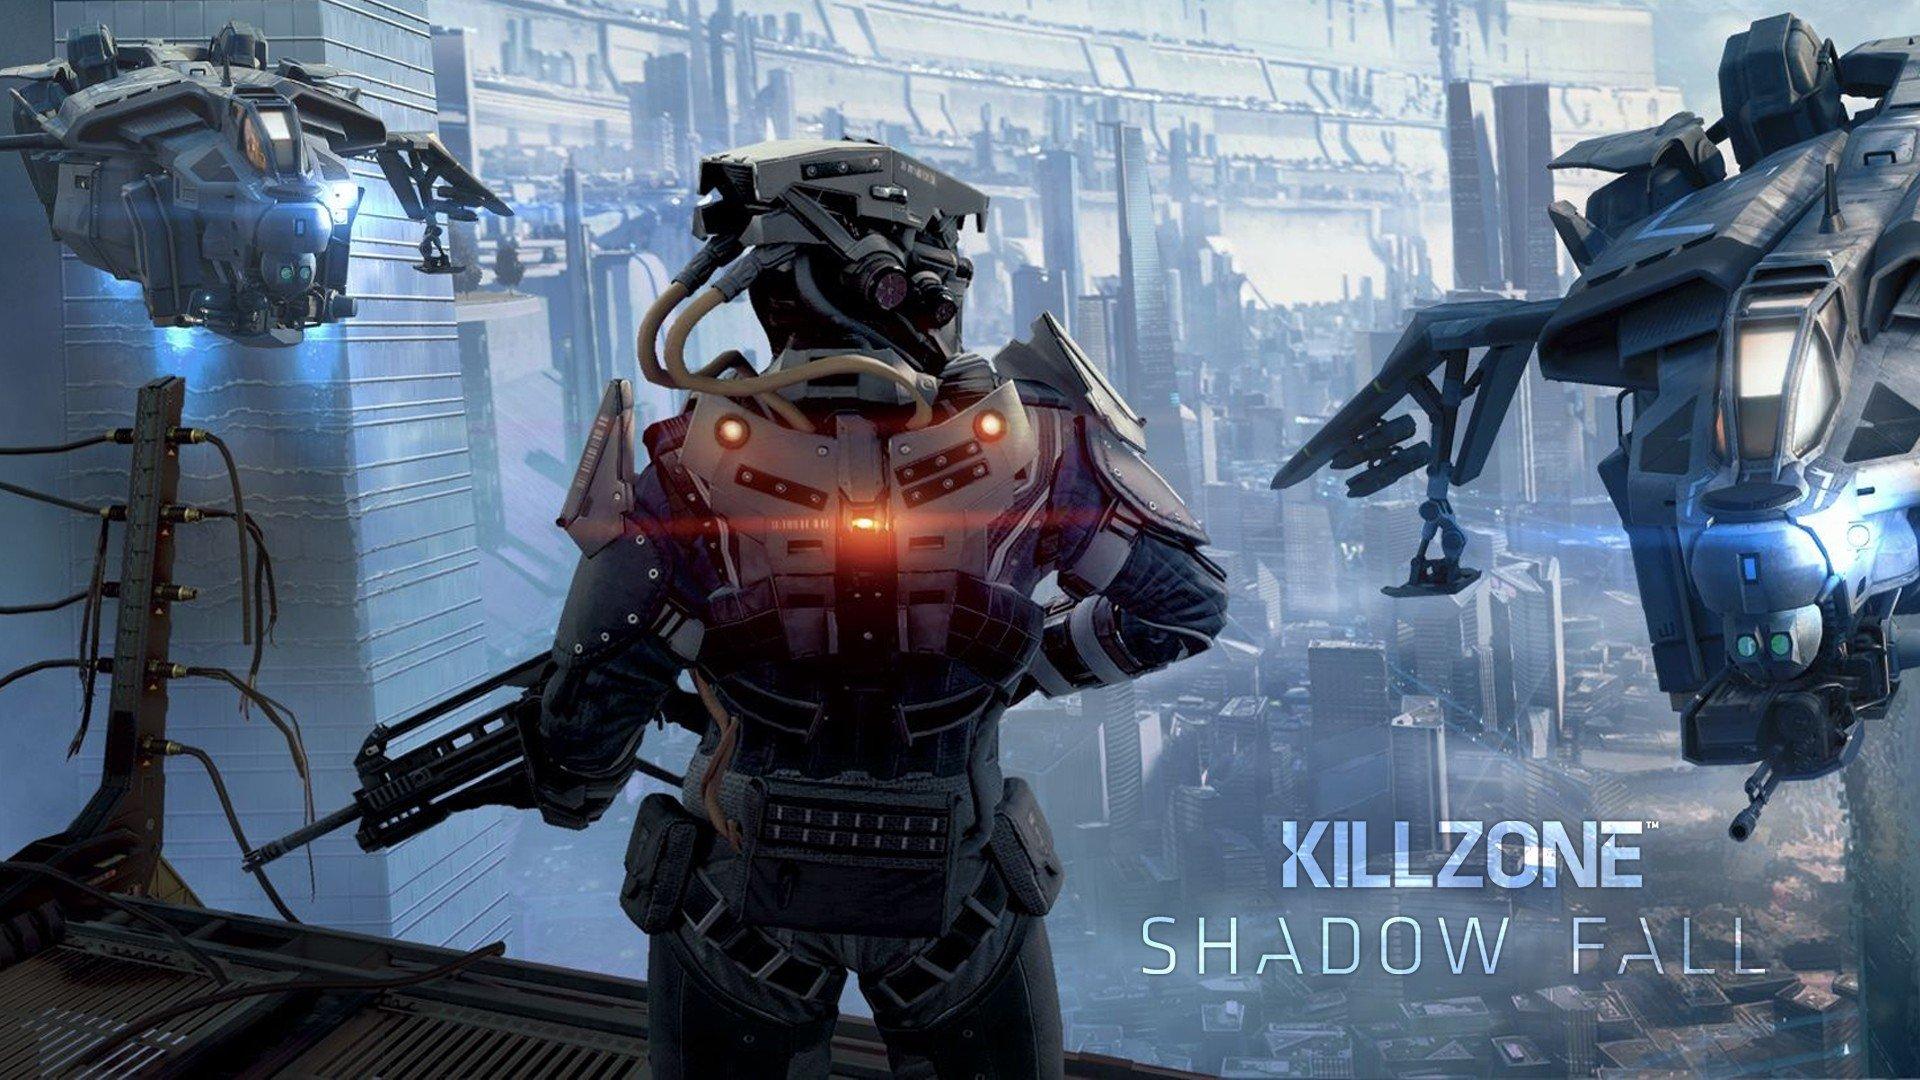 Killzone Shadow Fall Wallpaper